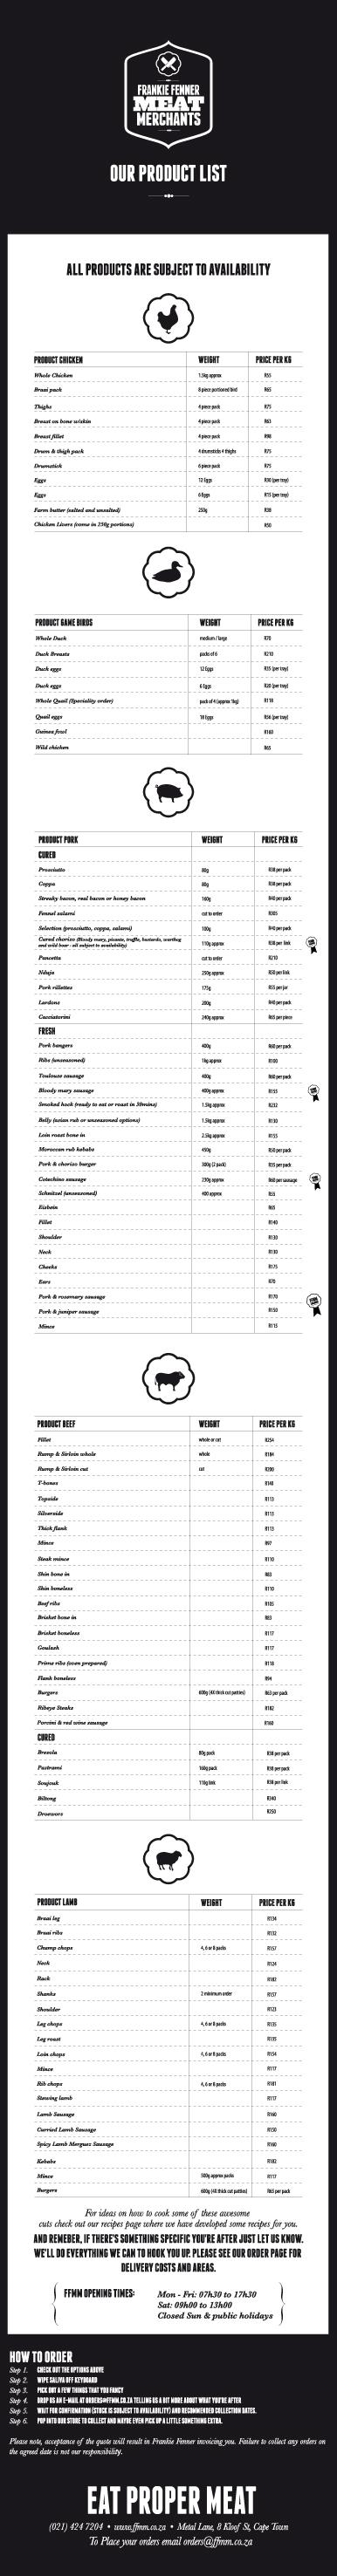 Product price list/Gallery - frankie fenner meat merchants